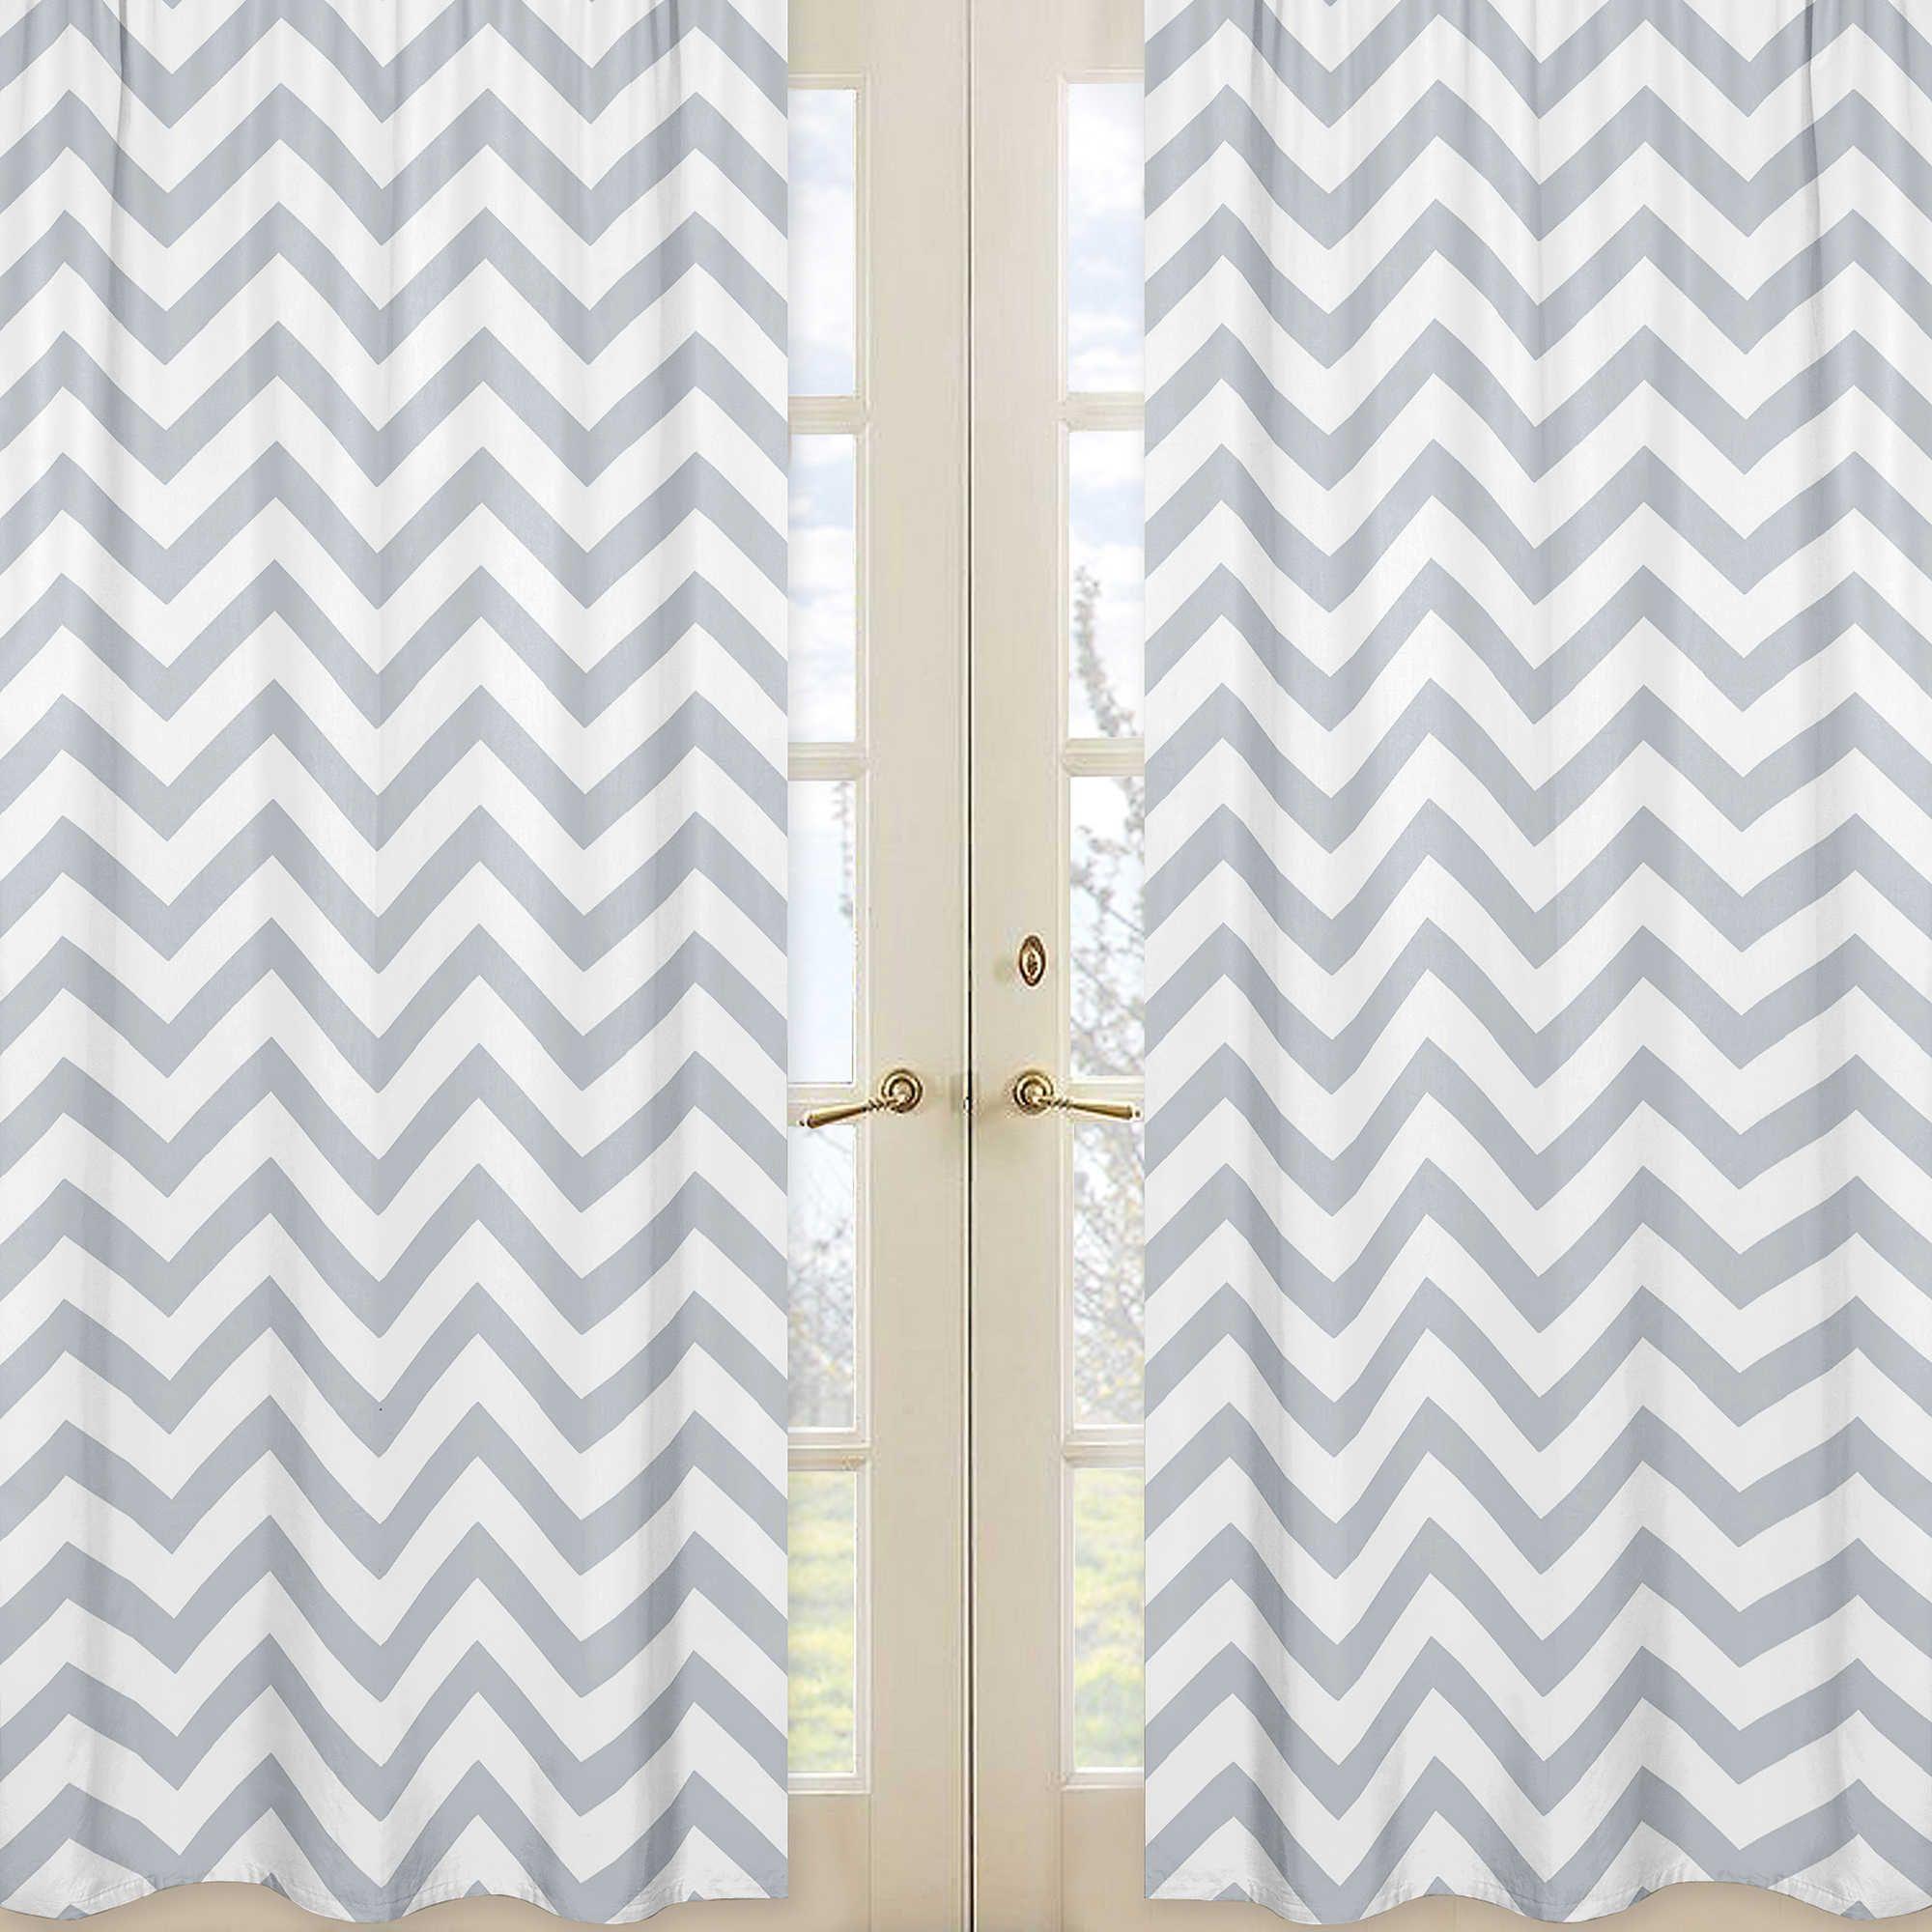 Sweet Jojo Designs Chevron Window Panel Pair In Grey And White Curtains Rod Pocket Curtain Panels